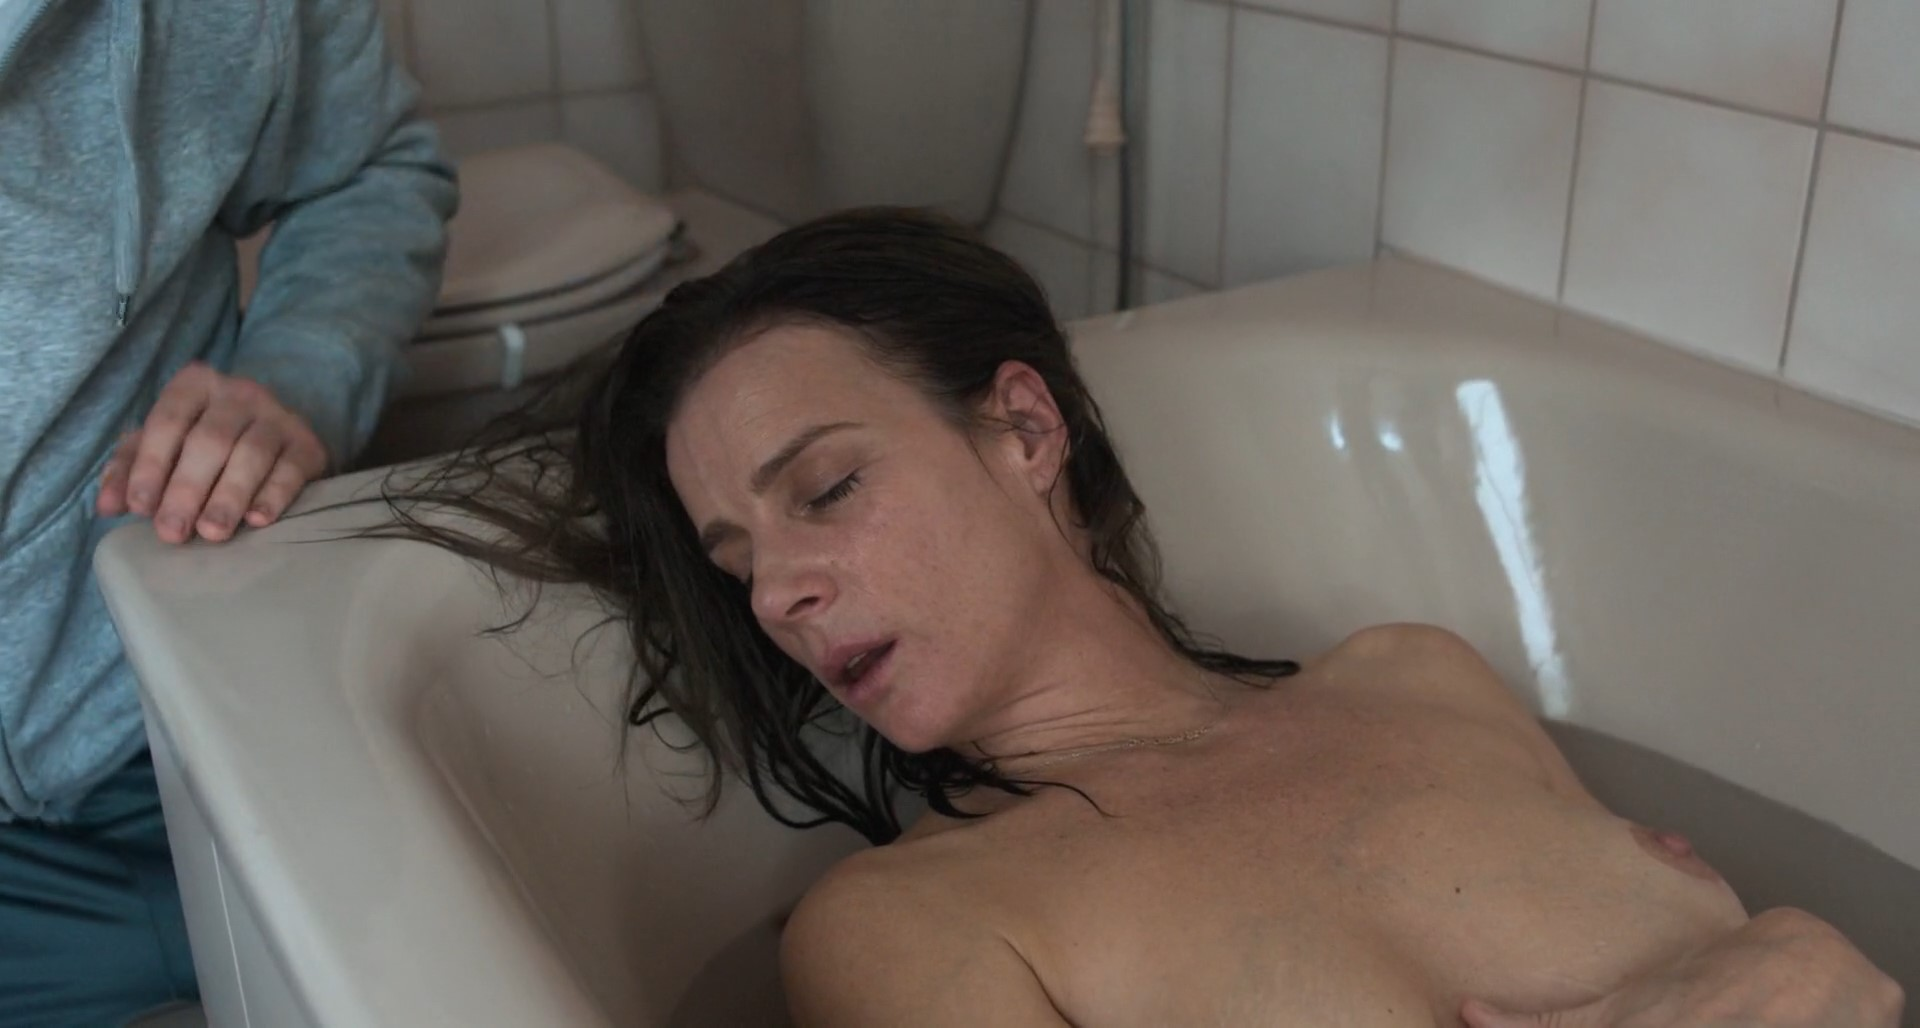 Rachel griffiths sex video